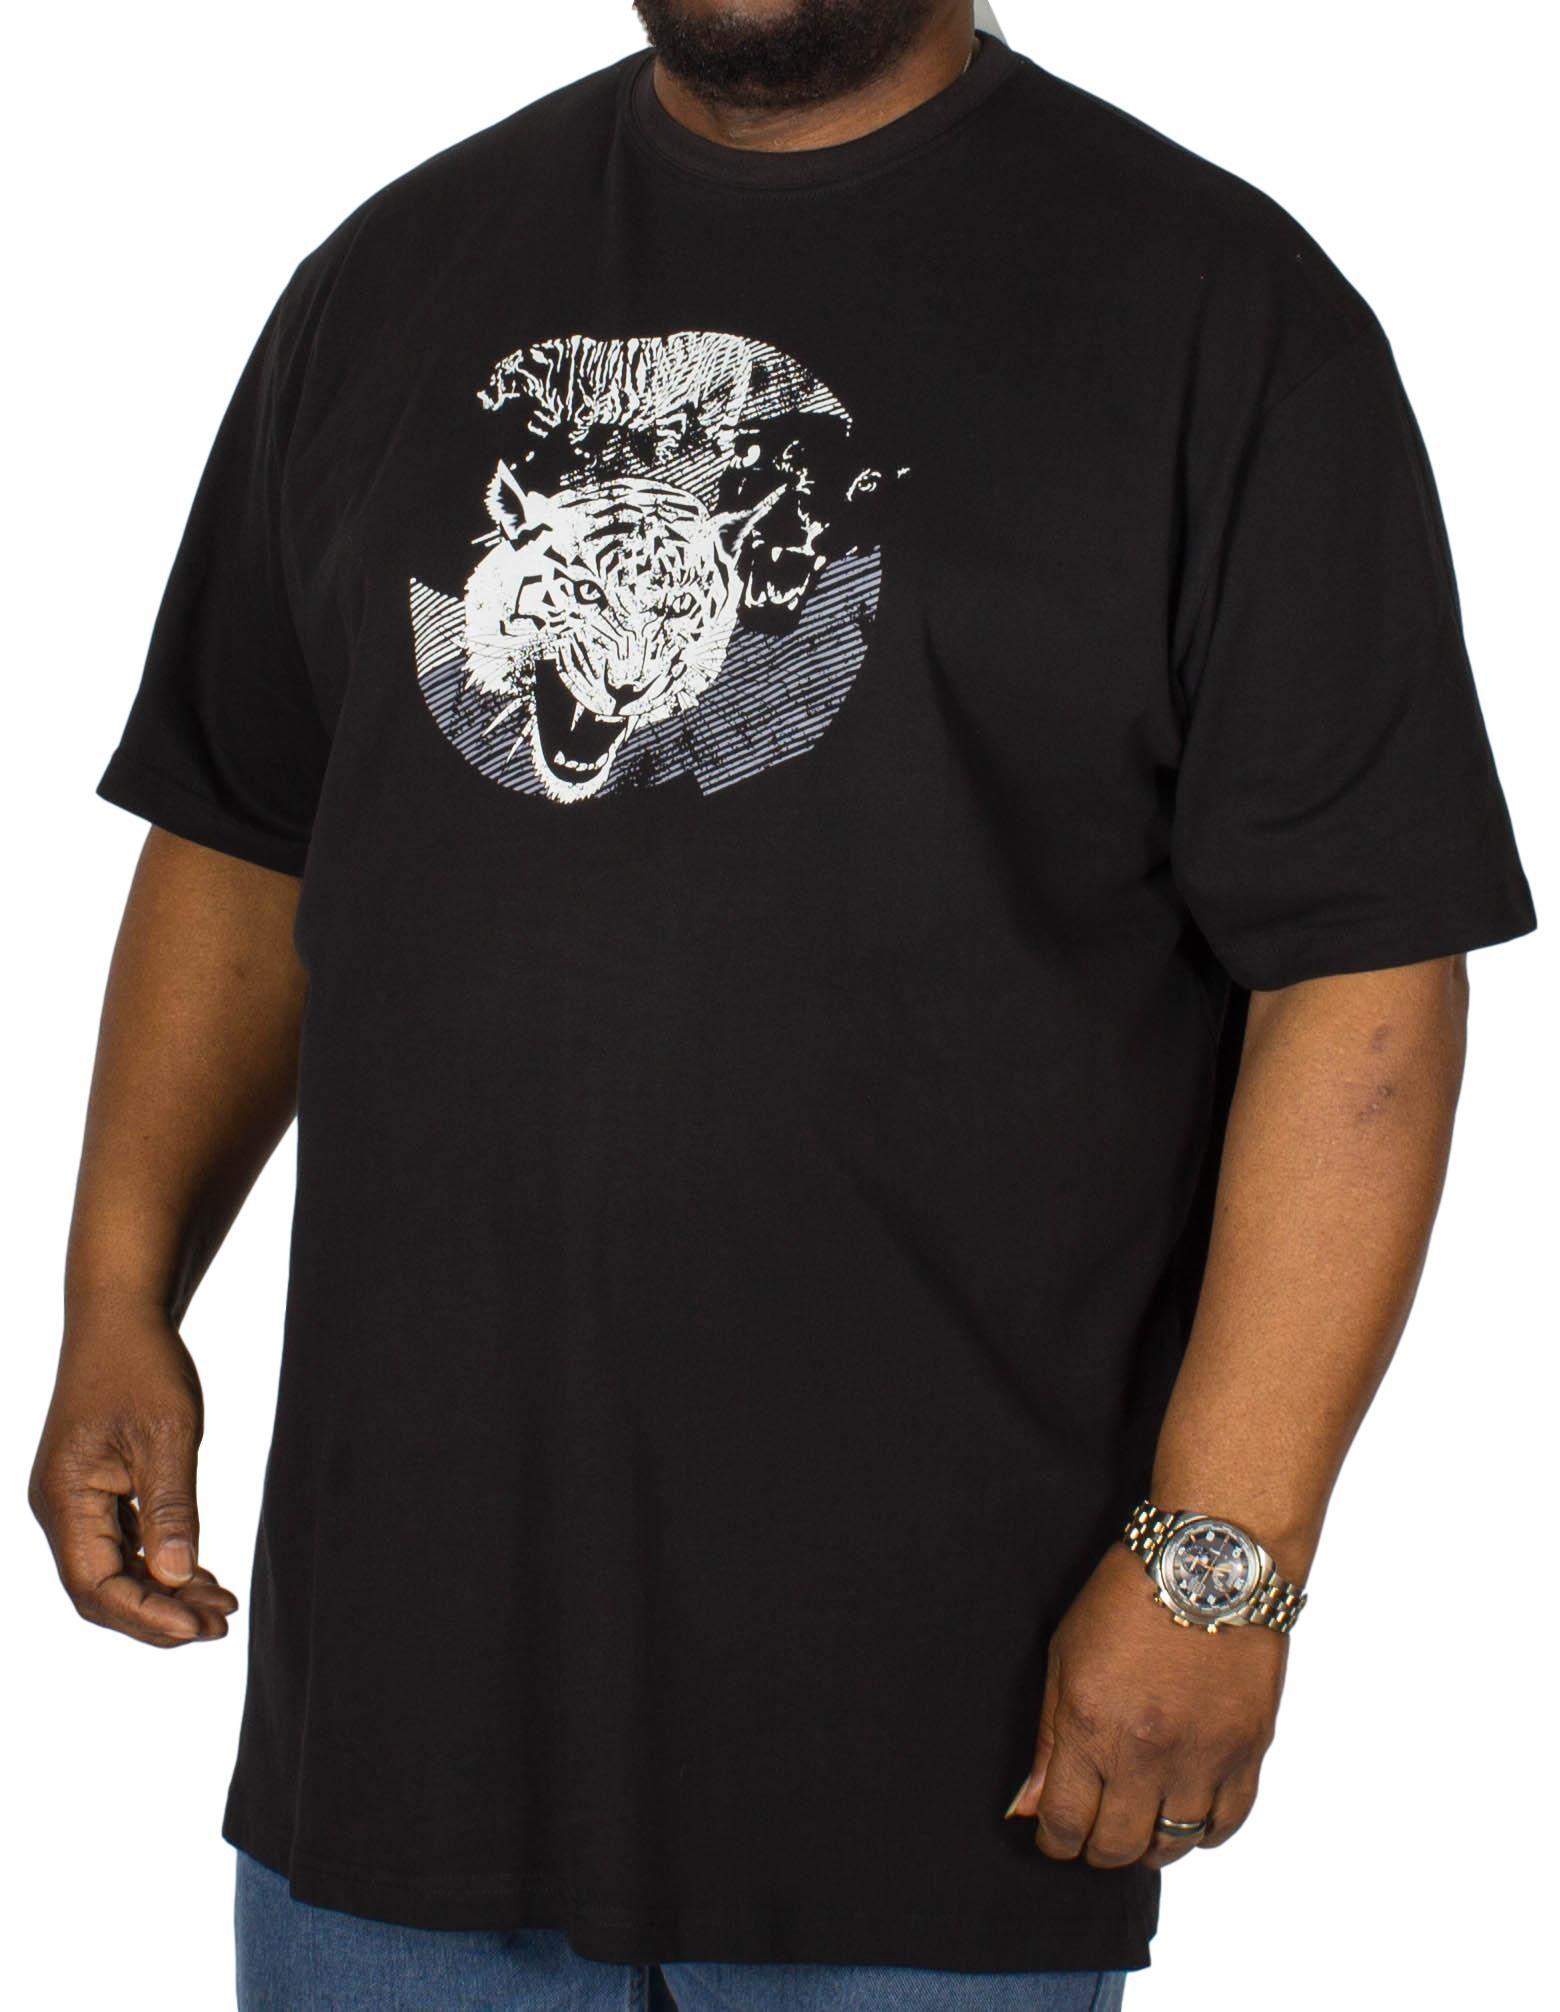 Cotton Valley Tiger Printed T-Shirt Black